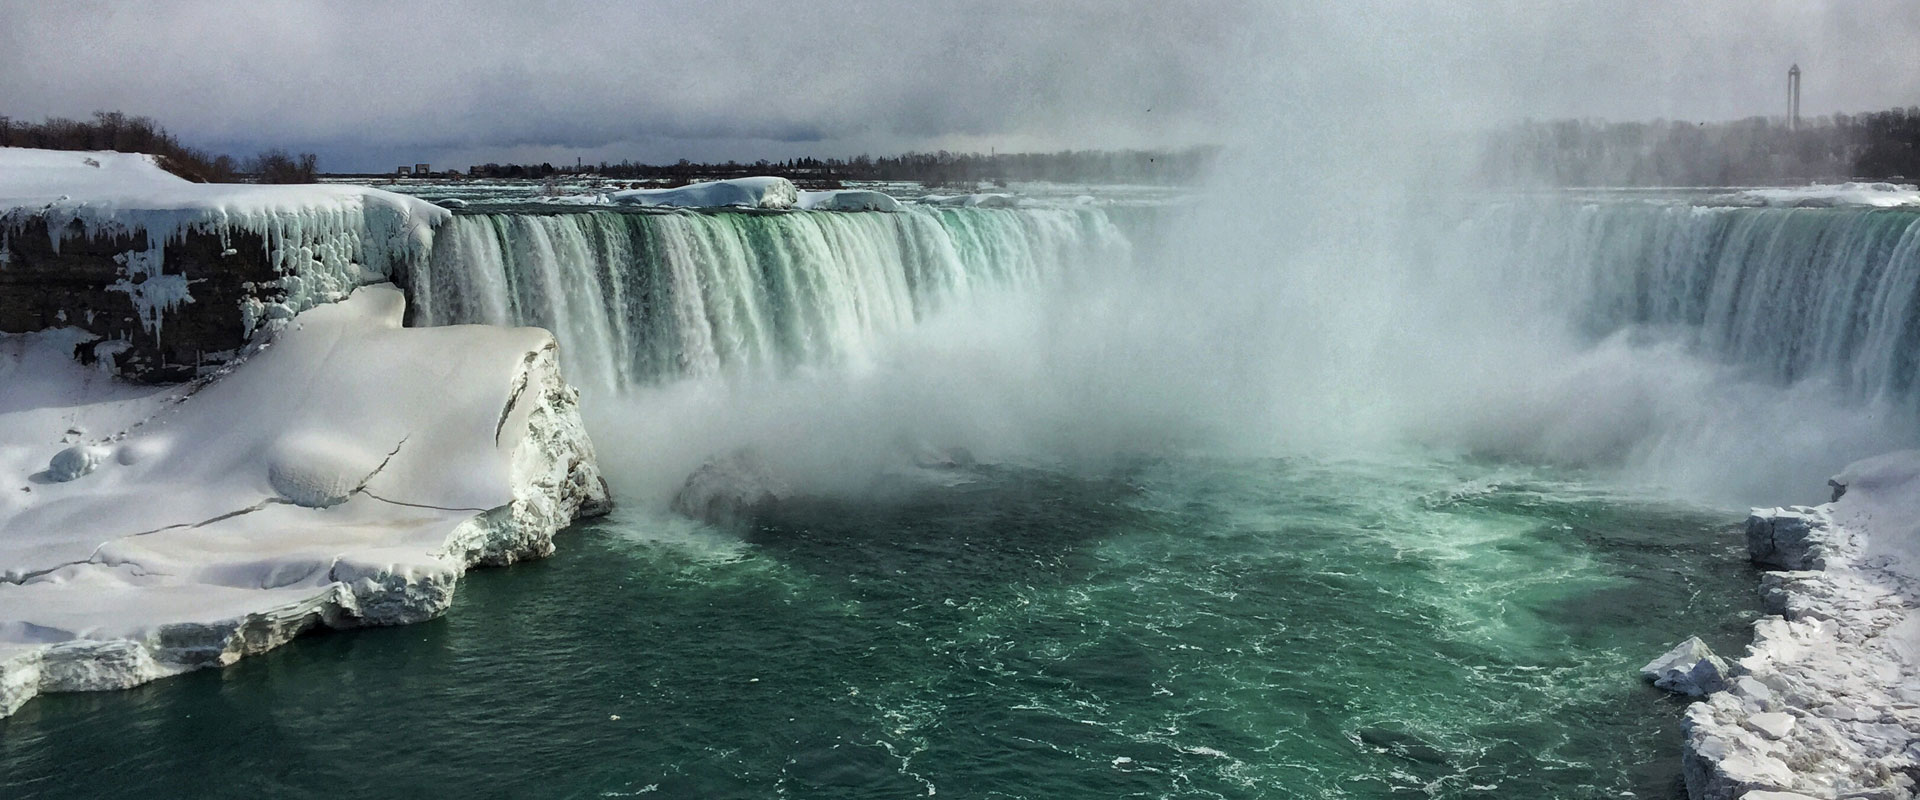 A Trip to Niagara Falls in December